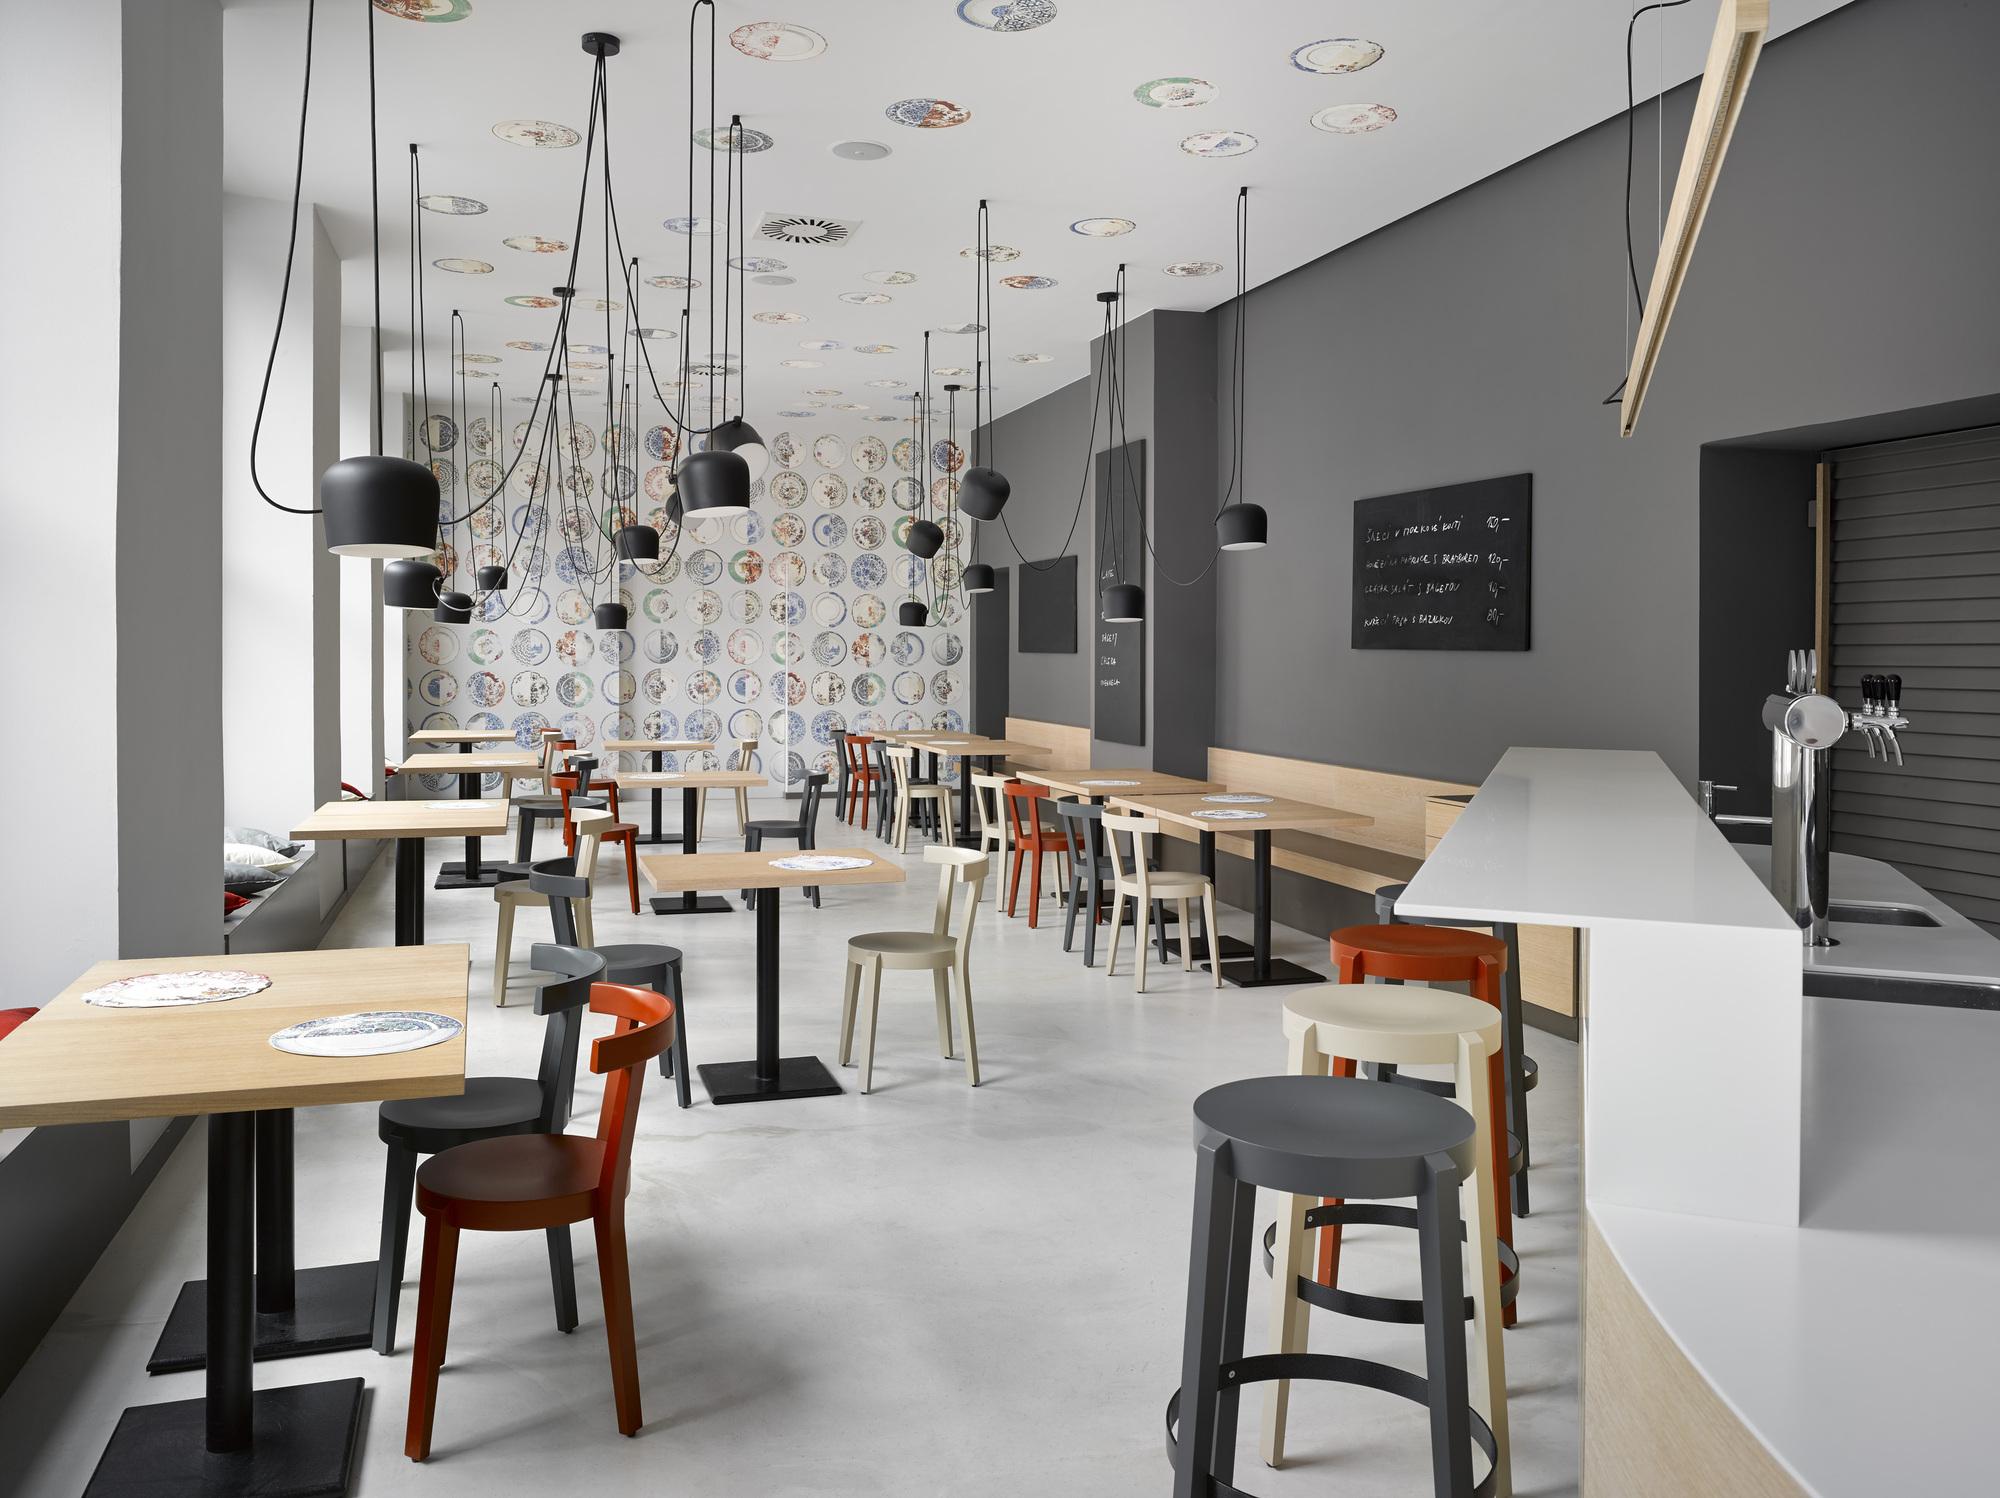 Gallery Of Cafe Bistro Bakery Zahorsky Jra Jarousek